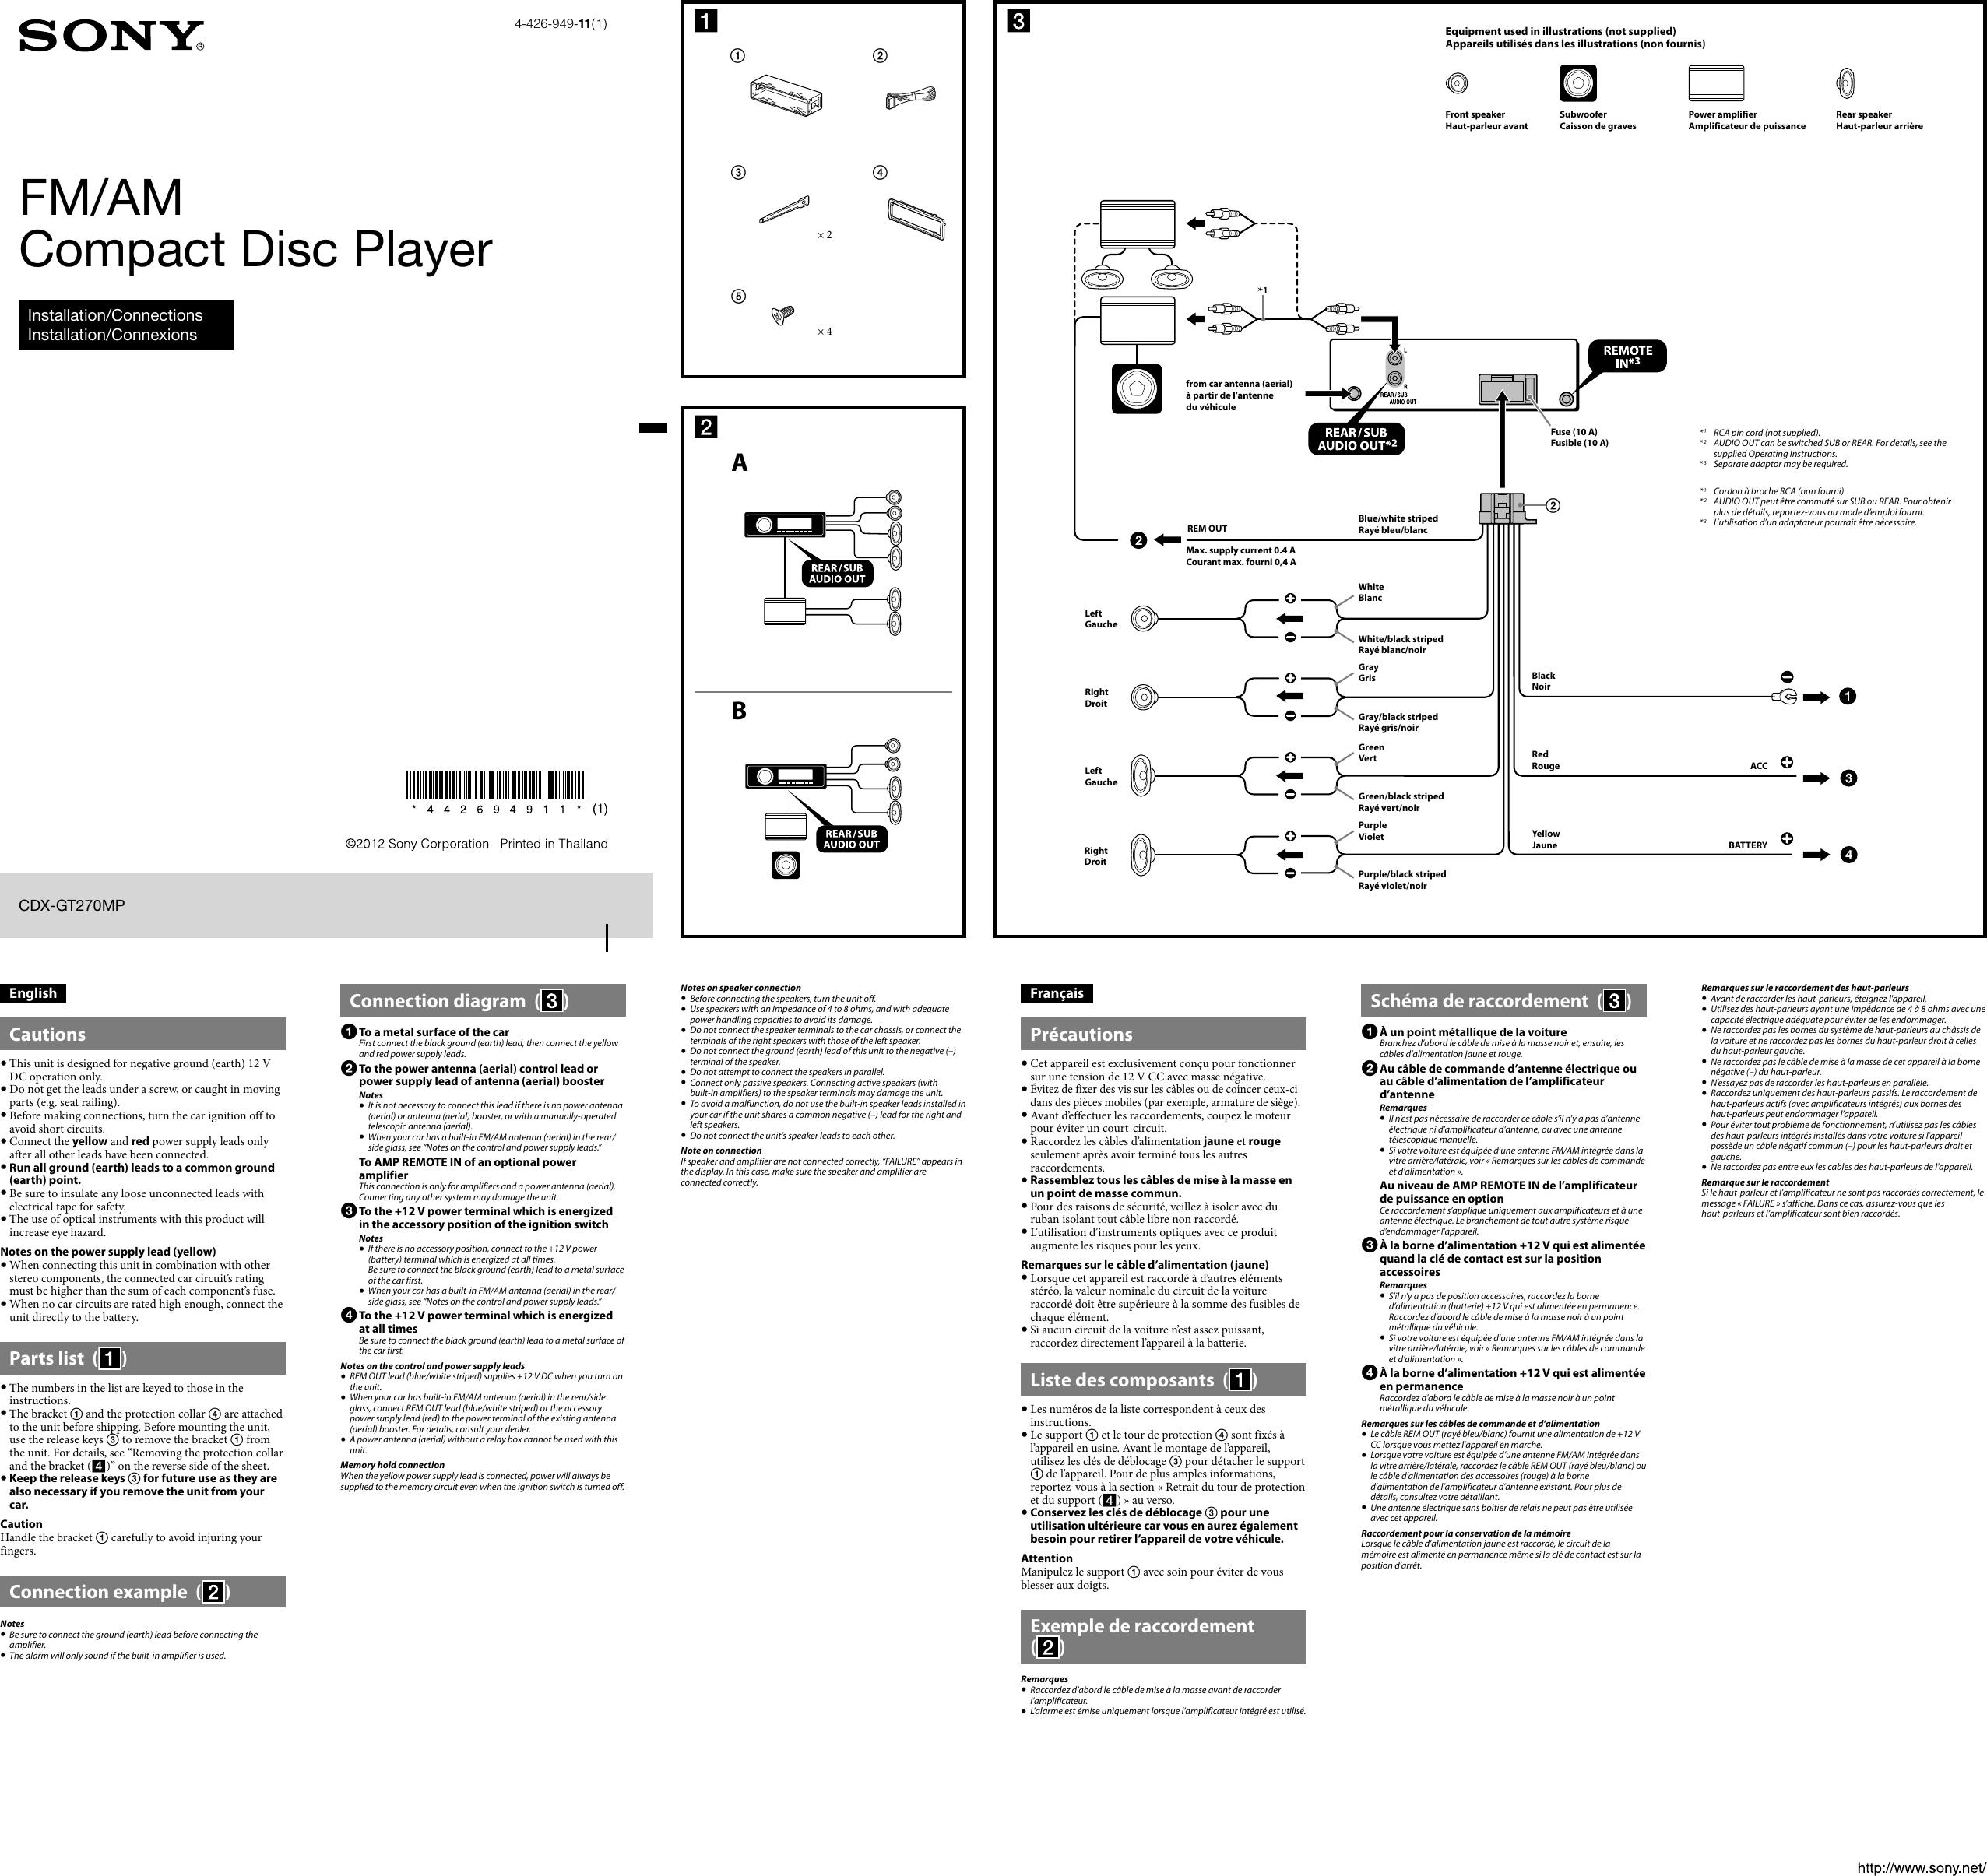 Remarkable Sony Gt270Mp Wiring Diagram Wiring Diagrams Wiring Cloud Waroletkolfr09Org